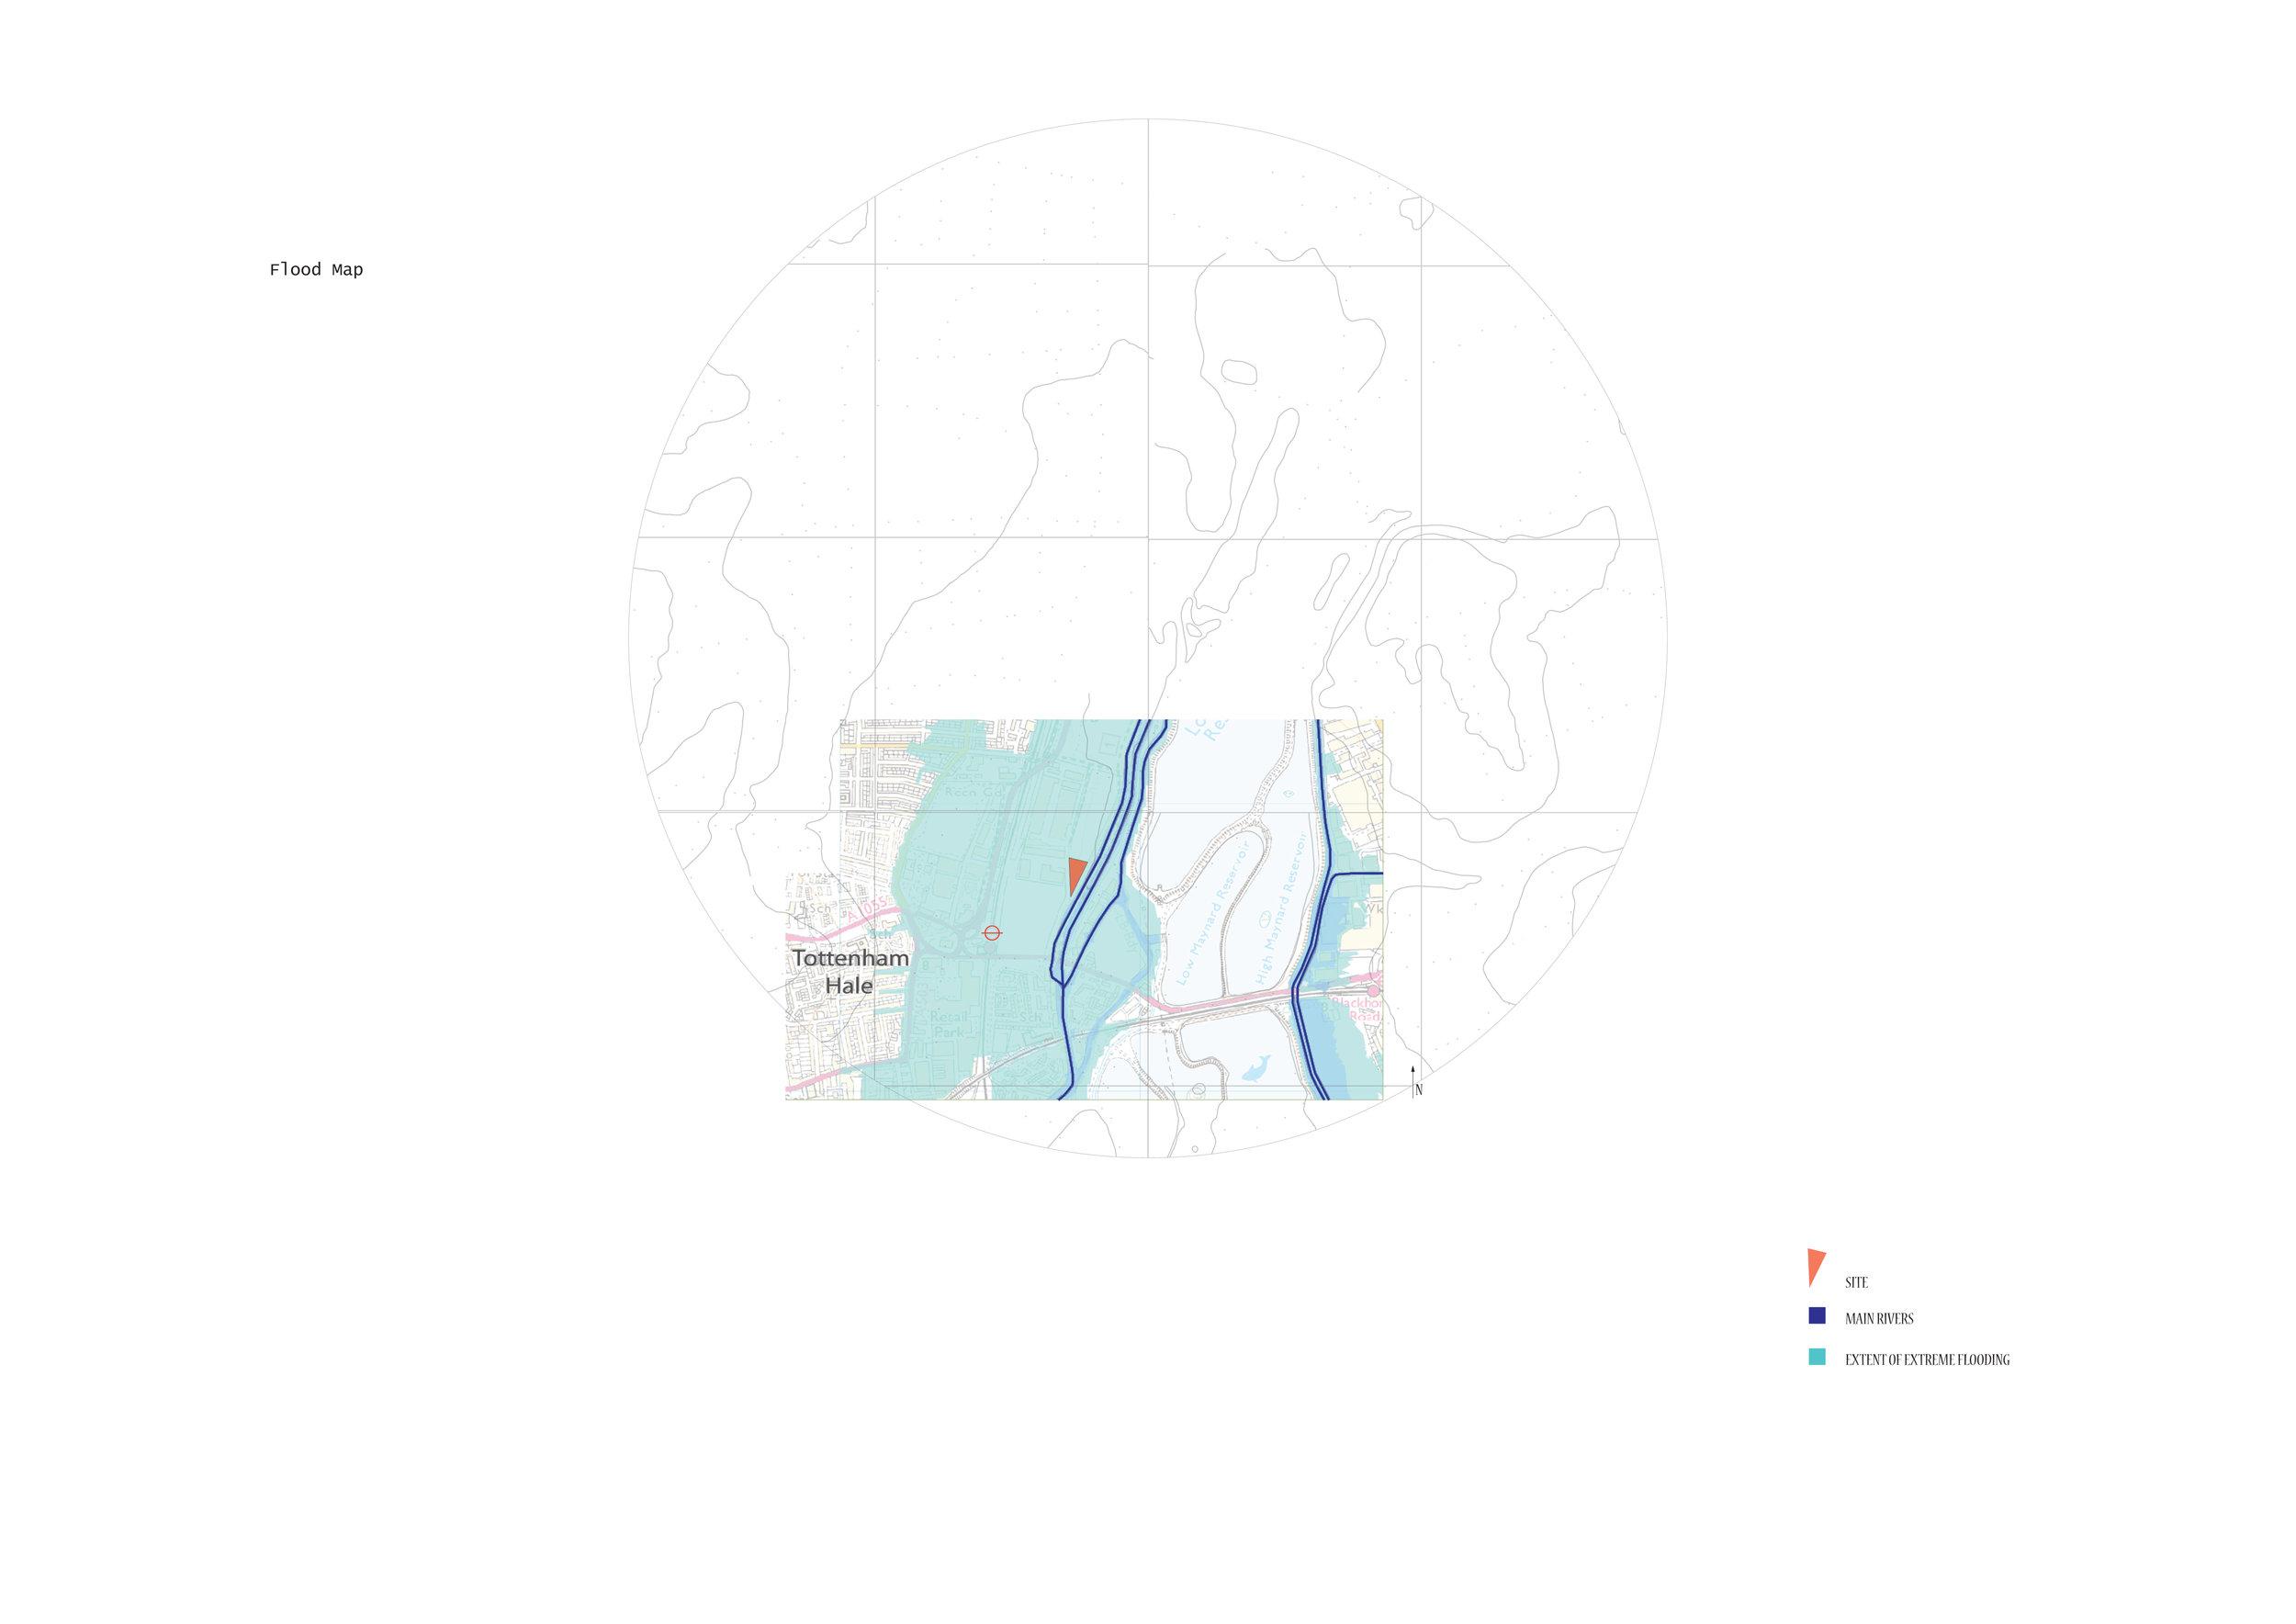 Diagram04_FloodMap.jpg